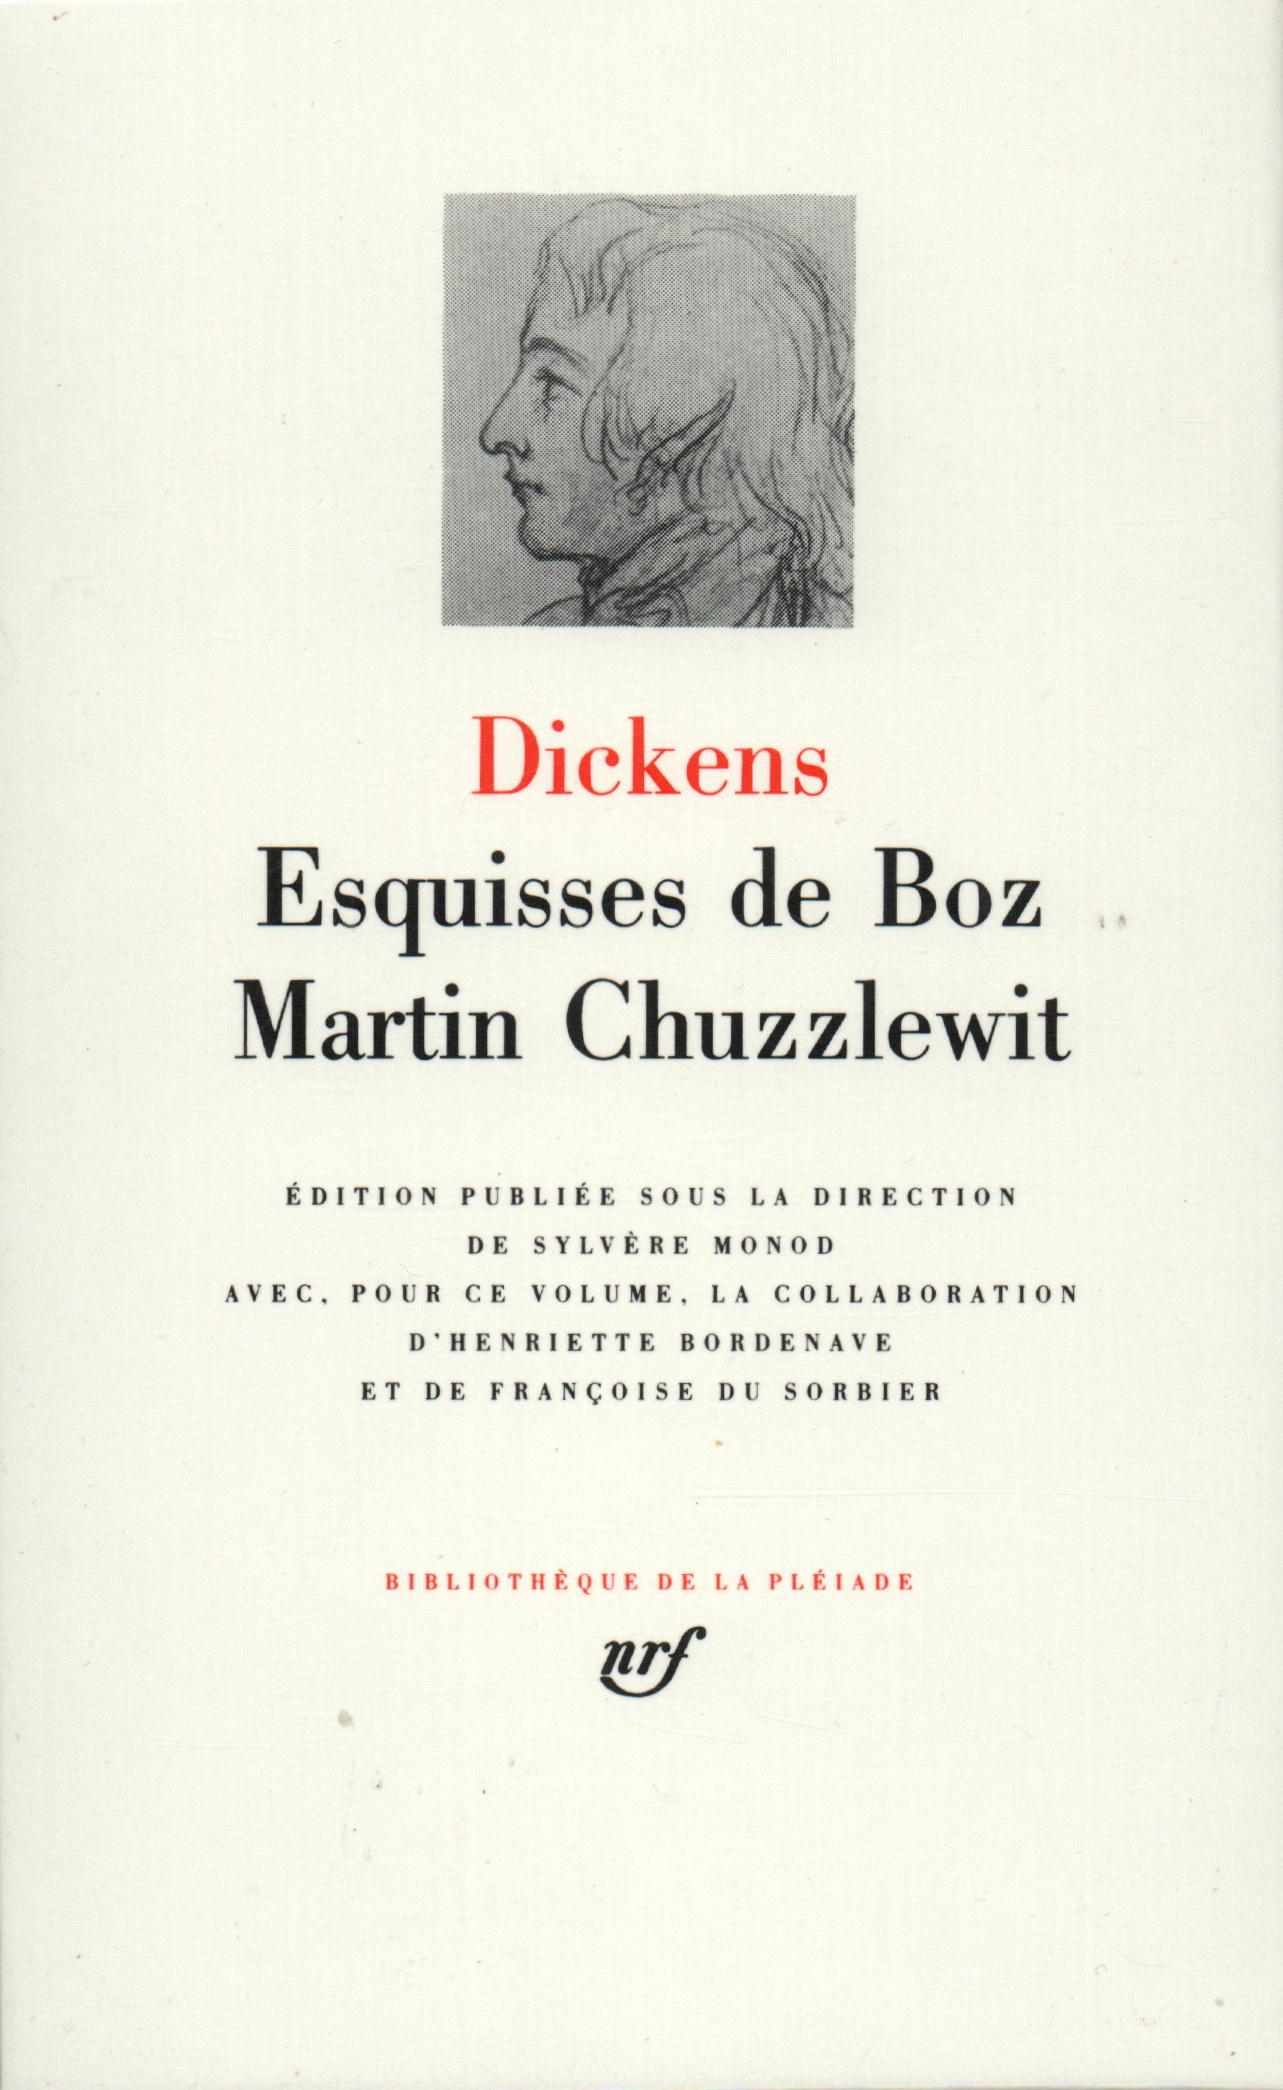 ESQUISSES DE BOZ / MARTIN CHUZZLEWIT